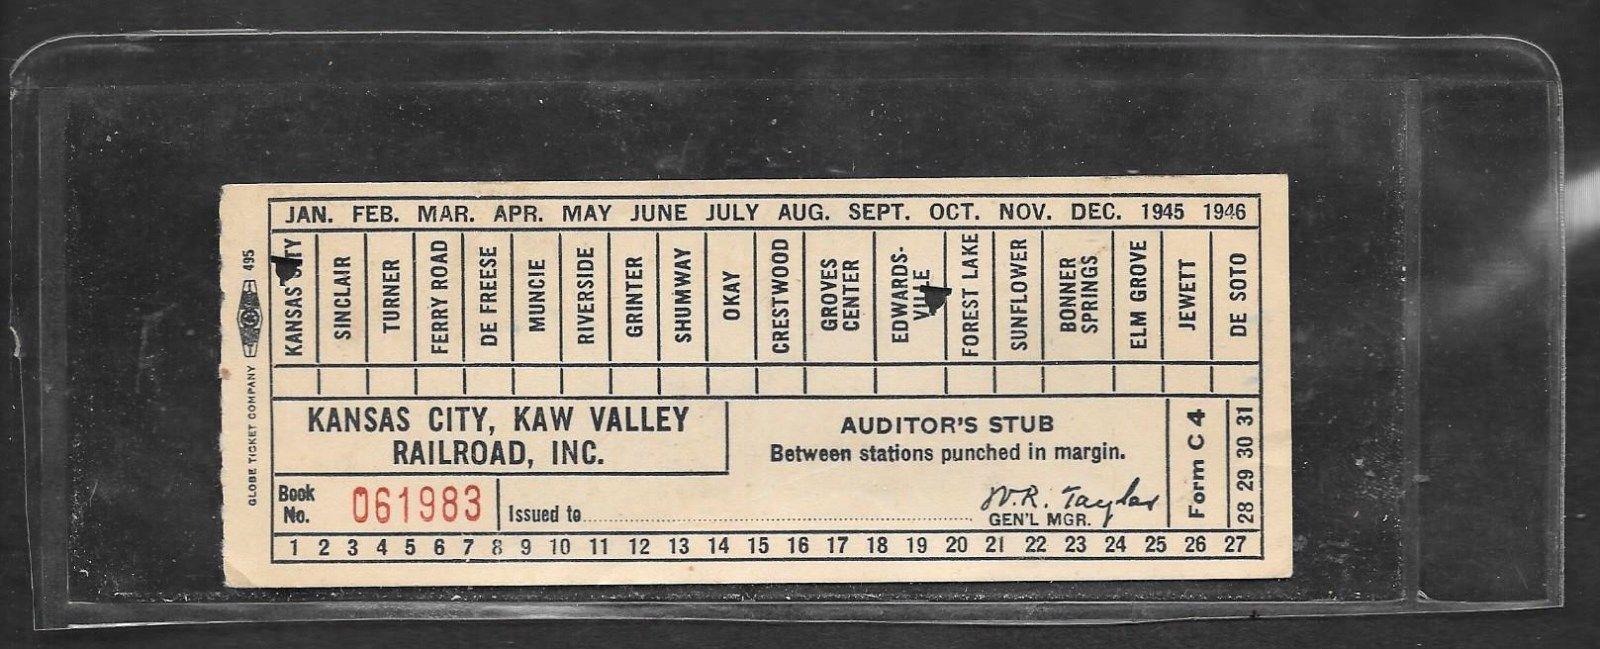 Kansas City (Missouri) Kaw Valley RR., Inc. (1945